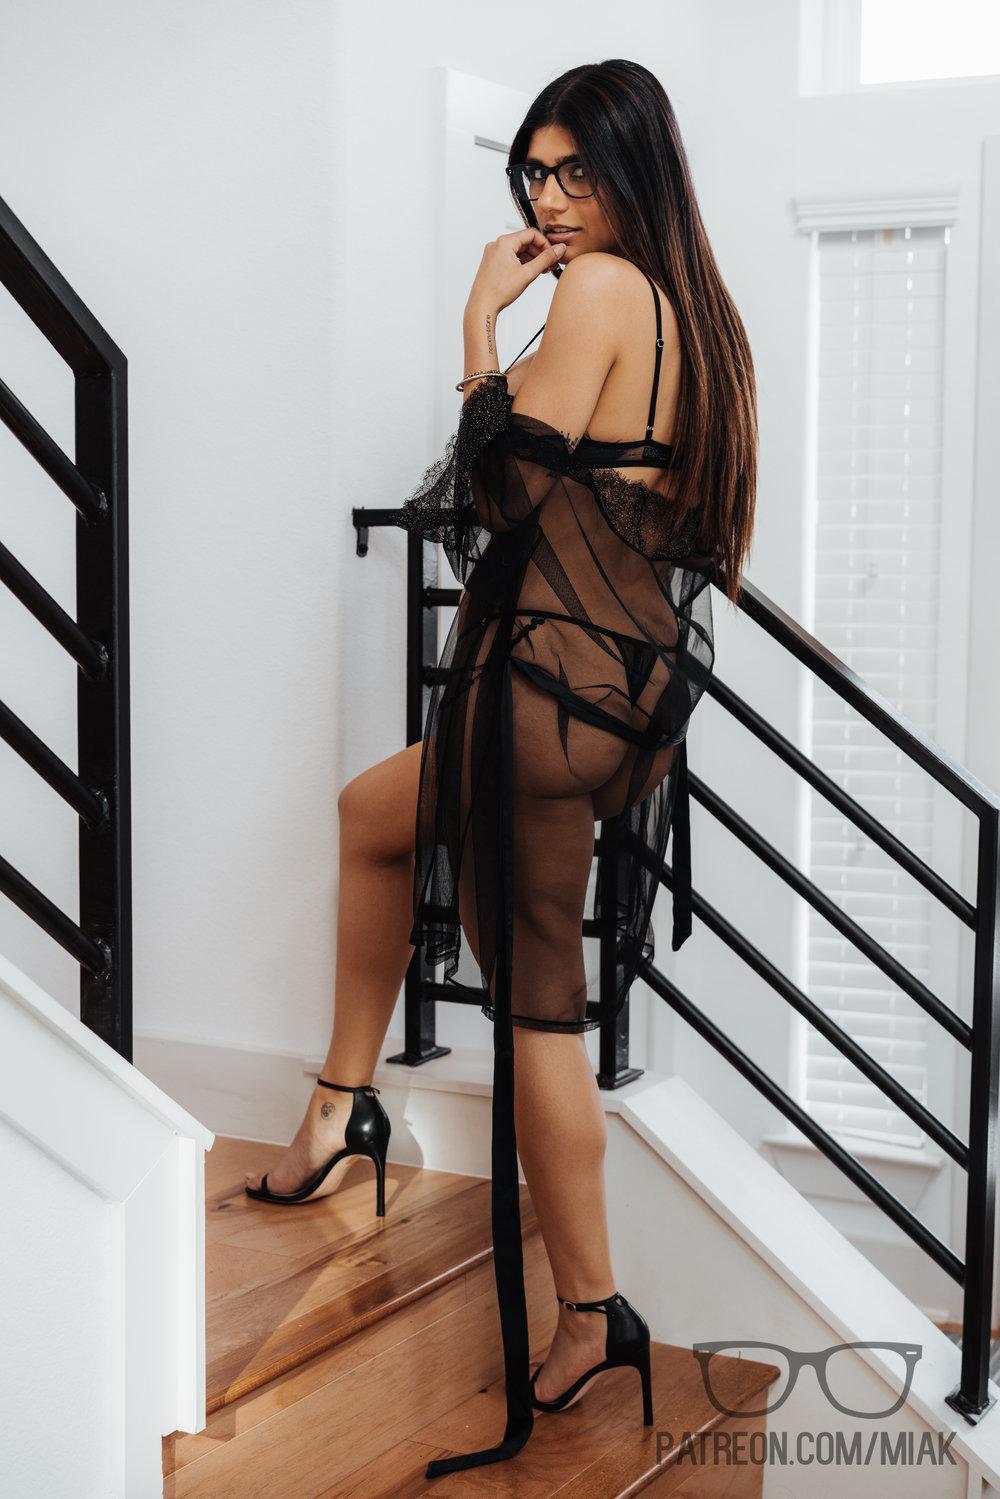 Mia Khalifa Lingerie Stiletto Heels Photoshoot Leaked 0022